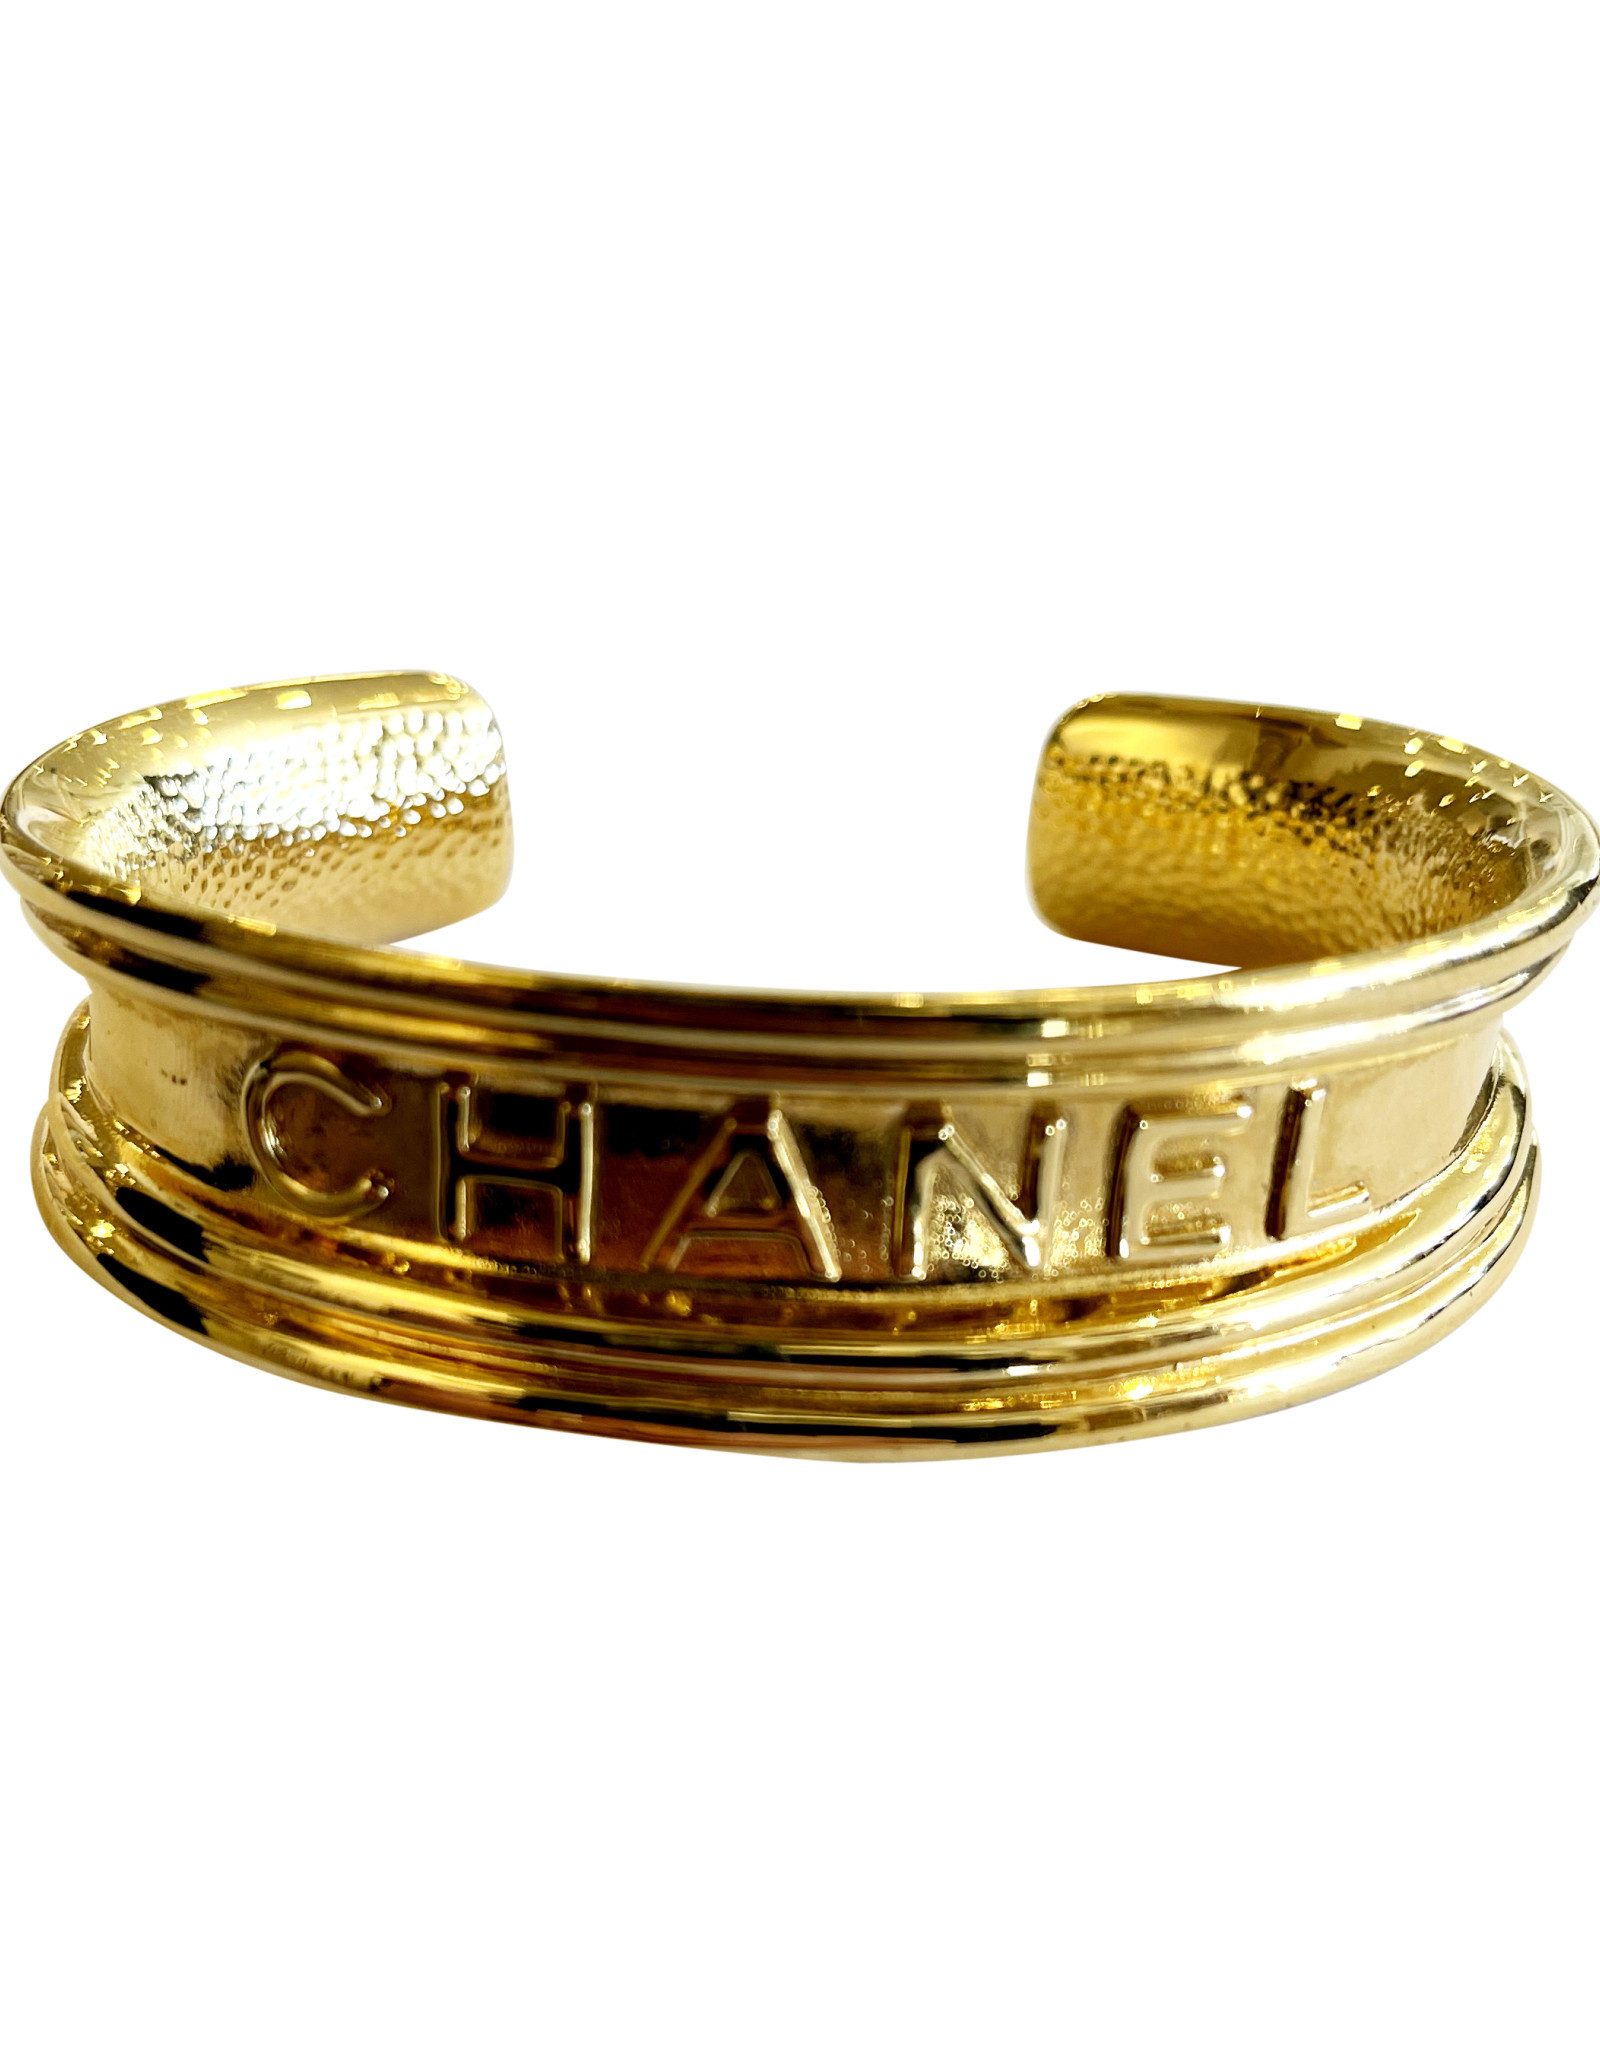 Wyld Blue Vintage Chanel Paris Logo Script Monogram Gold Bangle Cuff